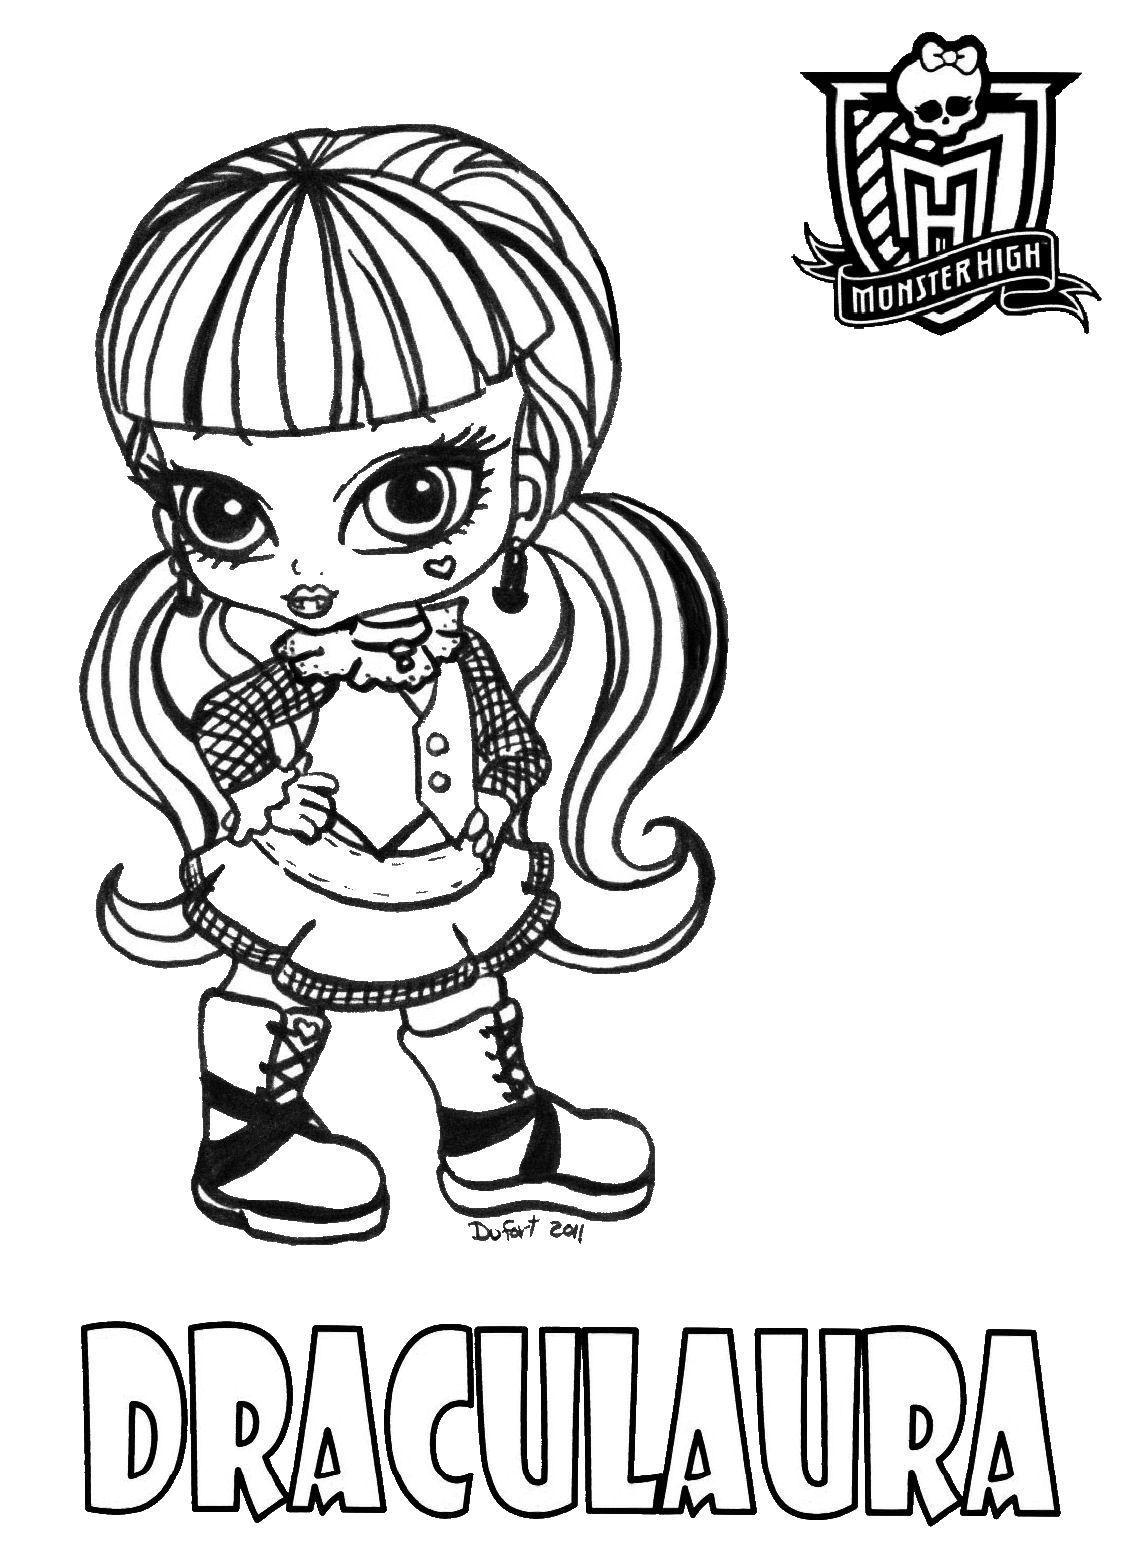 Monster High Draculaura Drawing At Getdrawings Com Free For